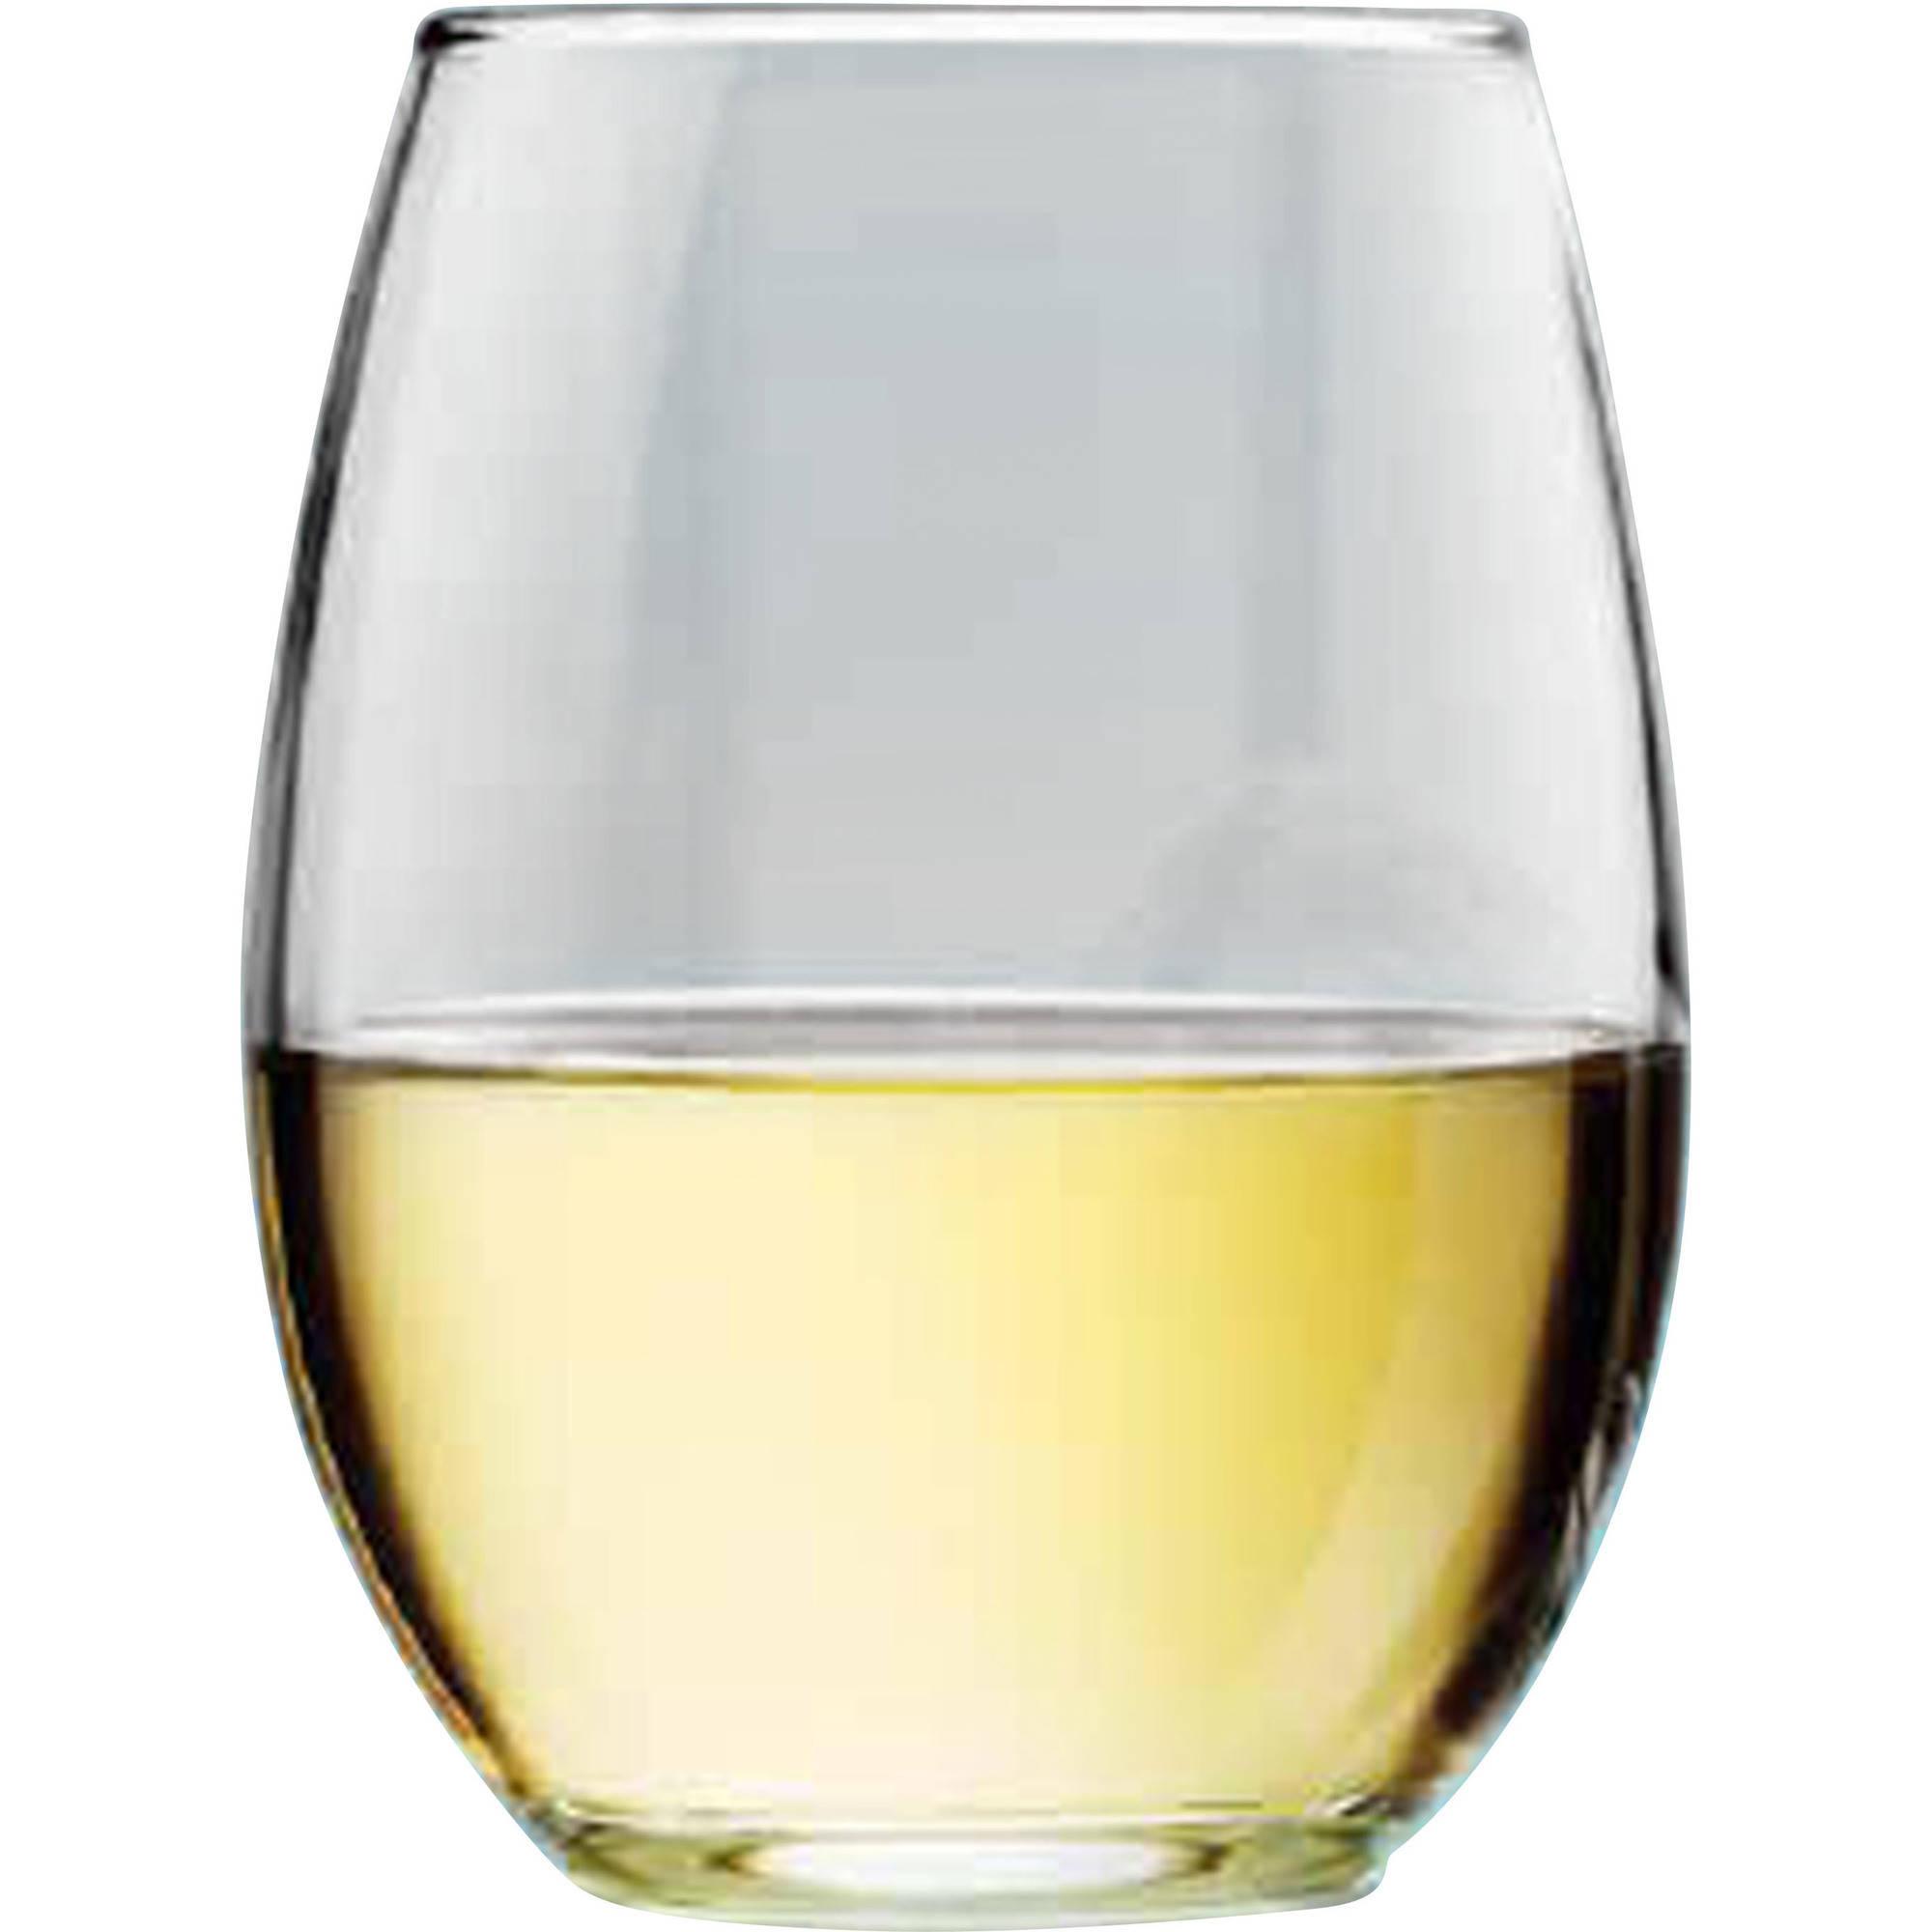 Luminarc 12-piece Stemless Wine Glasses Boxed Set - Walmart.com